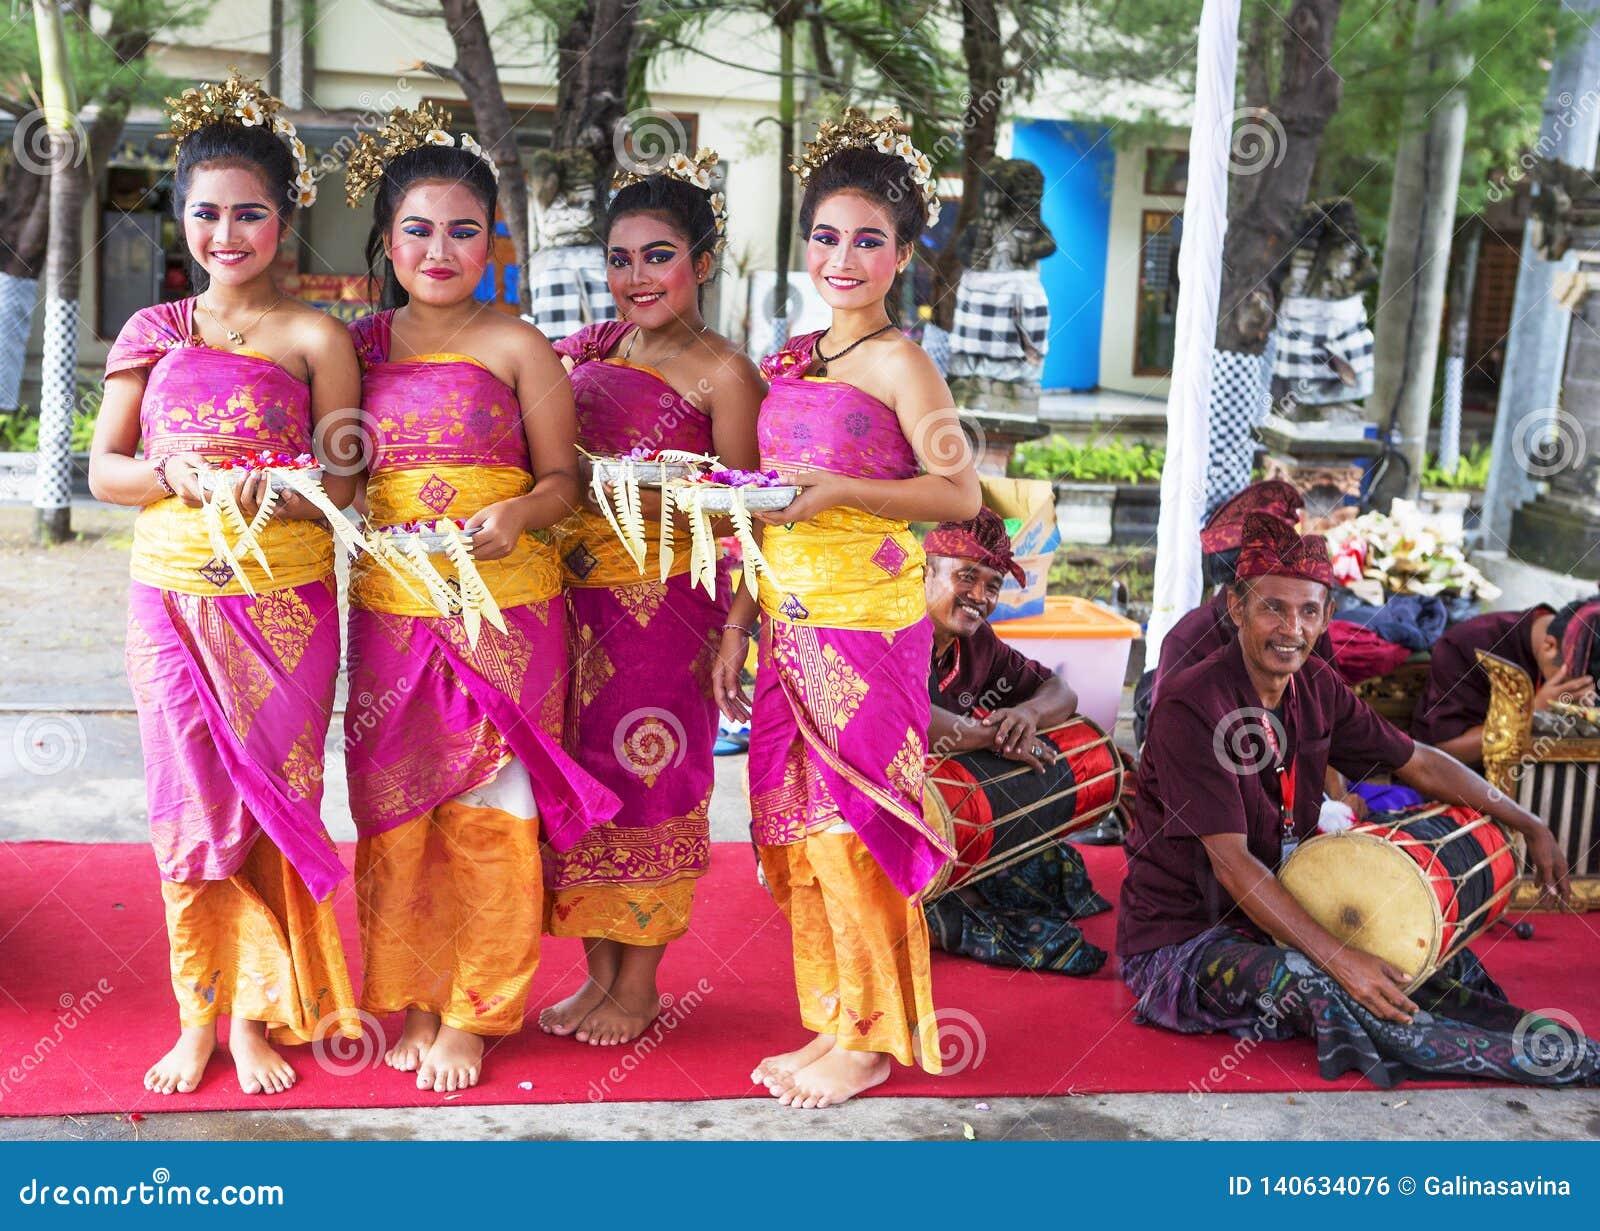 Bali Indonesia Girls In Indonesian Traditional Costume